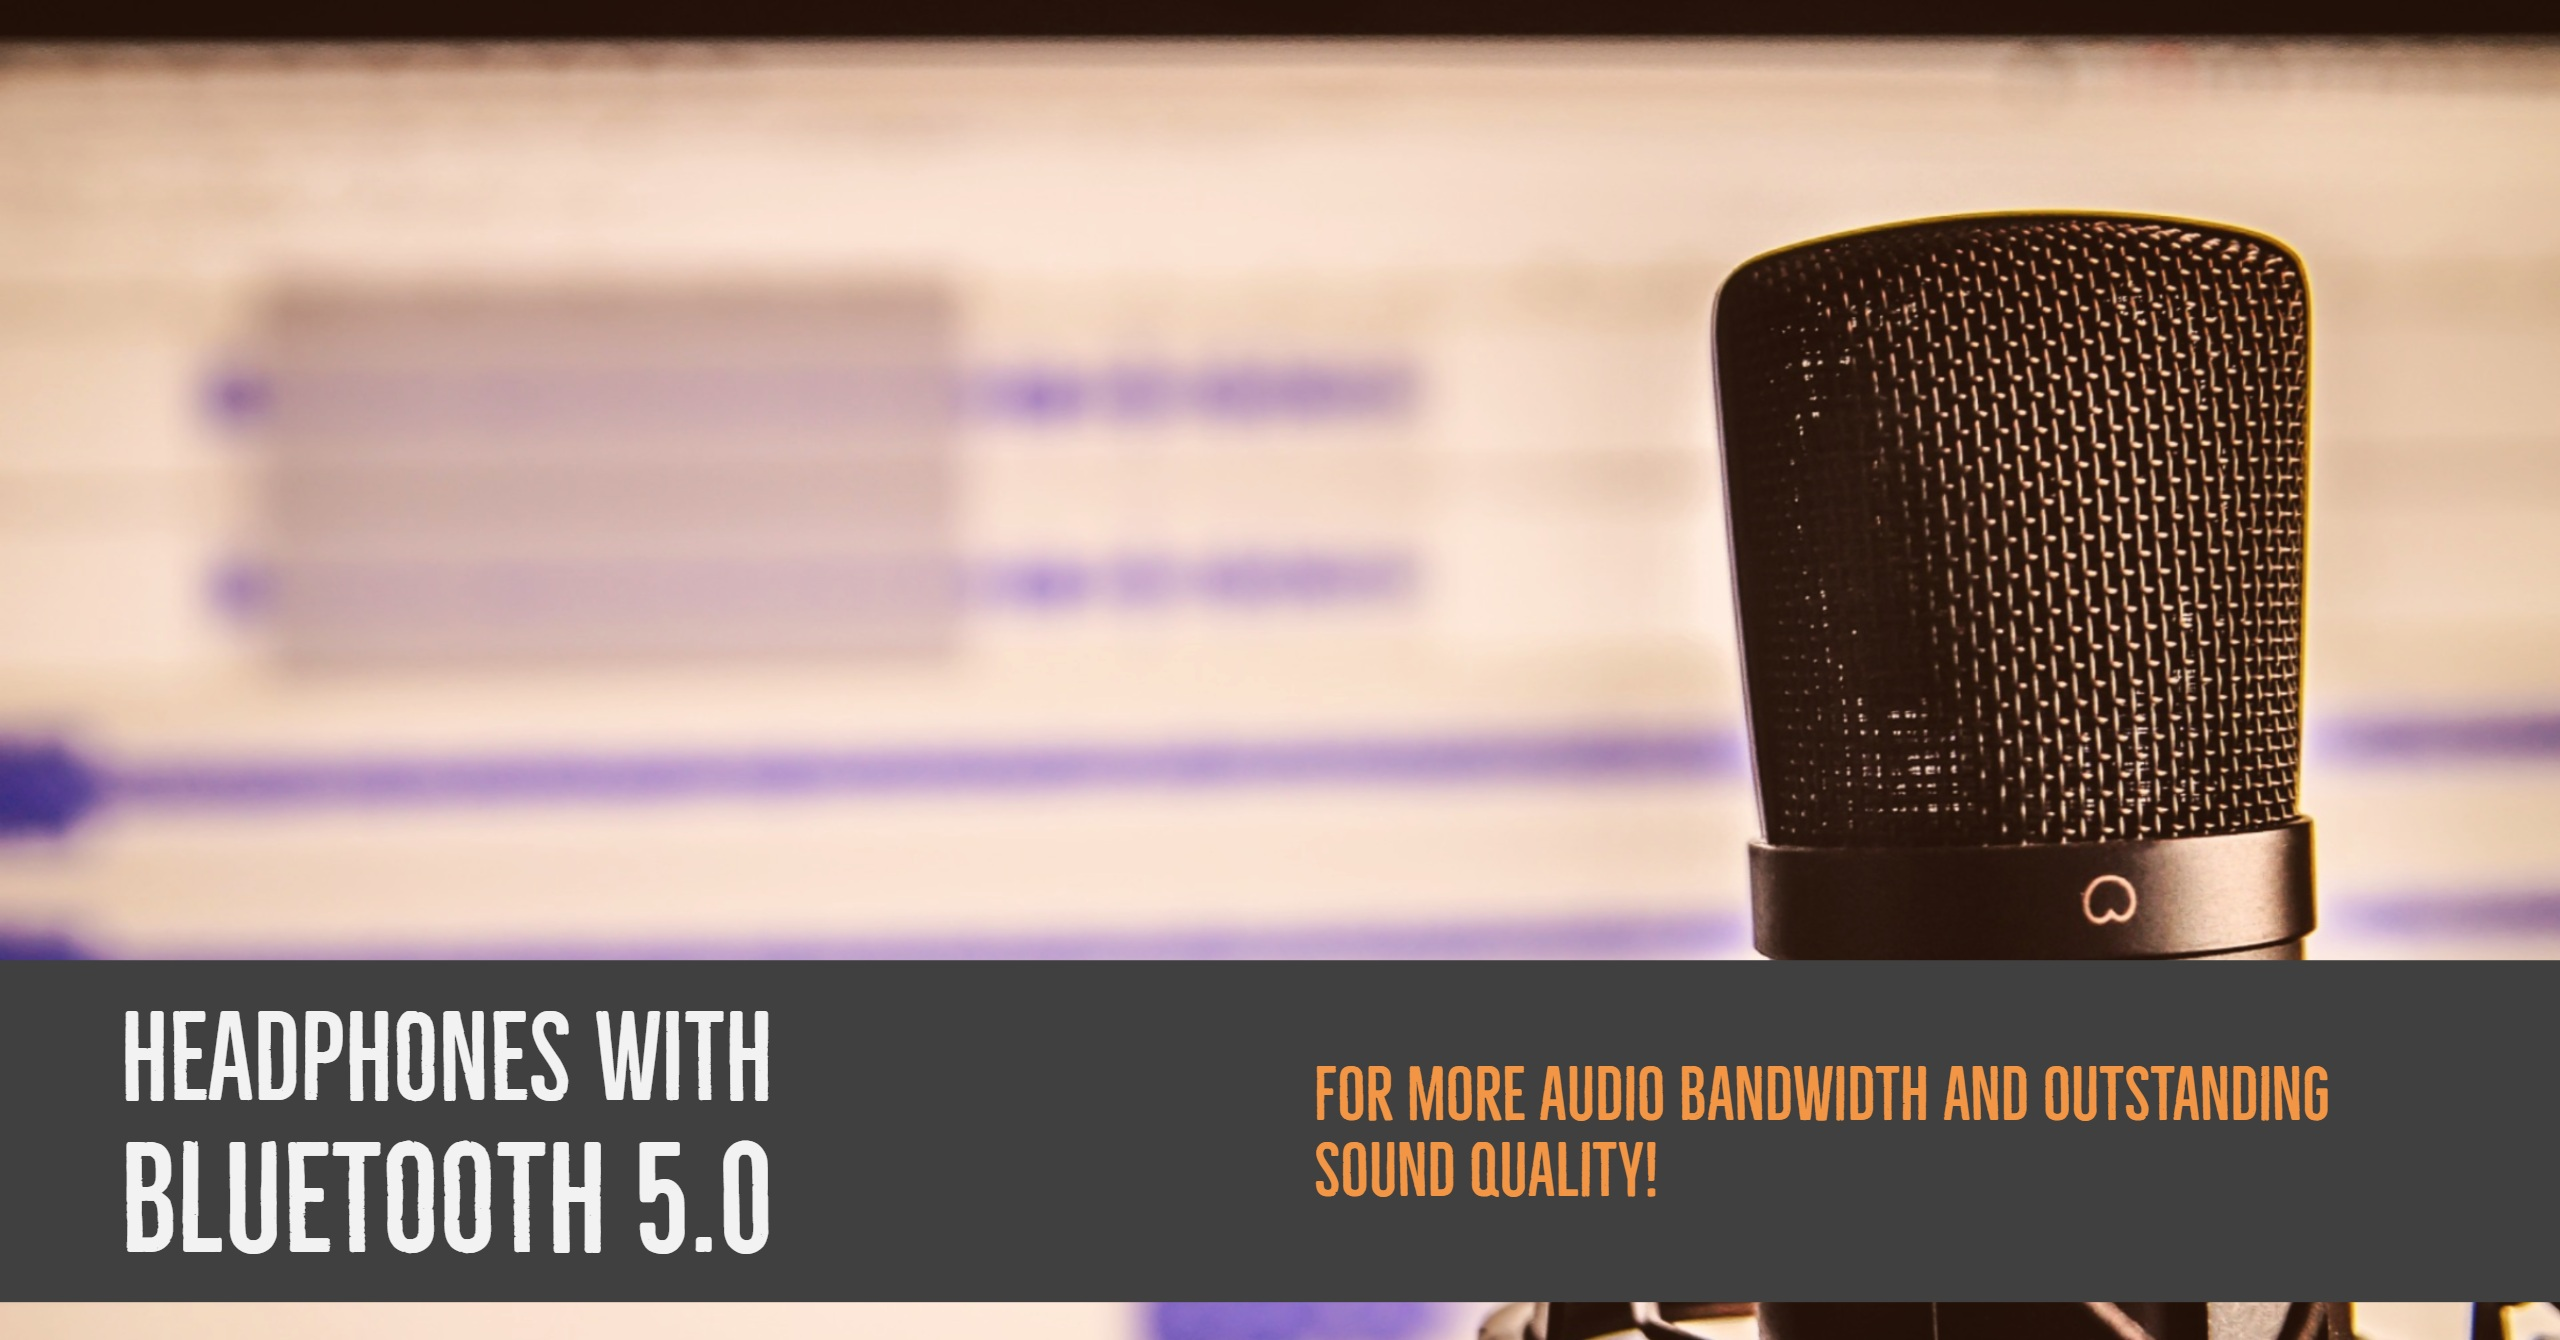 Wireless headphones running sennheiser - usb c headphones running